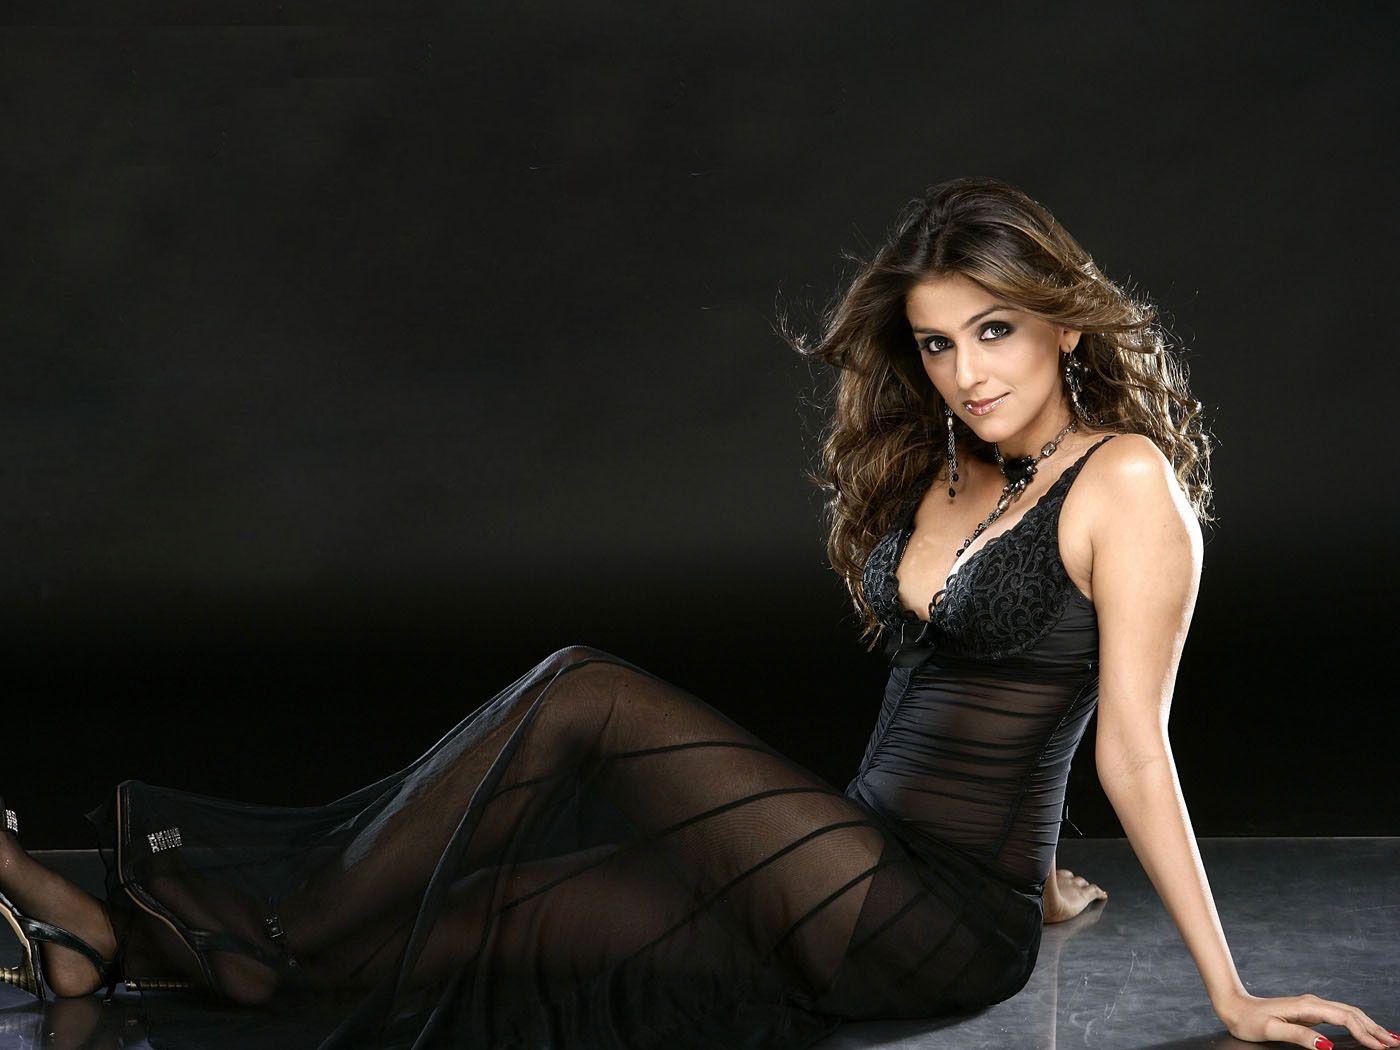 Aarti mann sexy pics